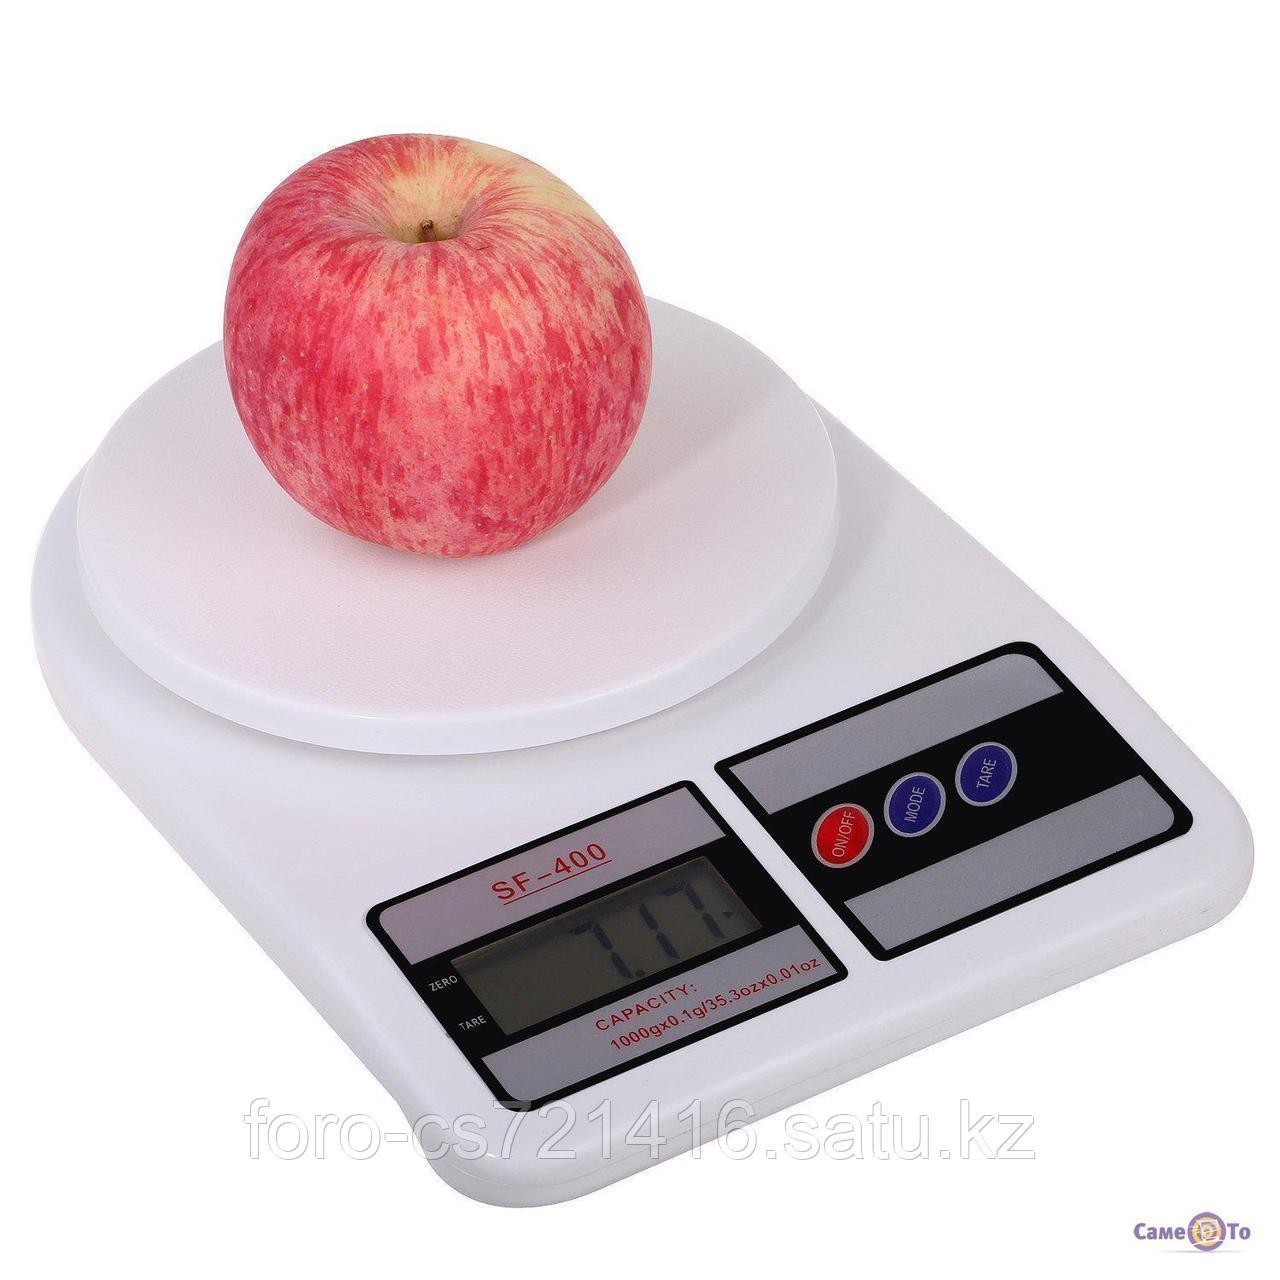 Кухонные электронные весы Tanita Electronic Kitchen Scale SF-400